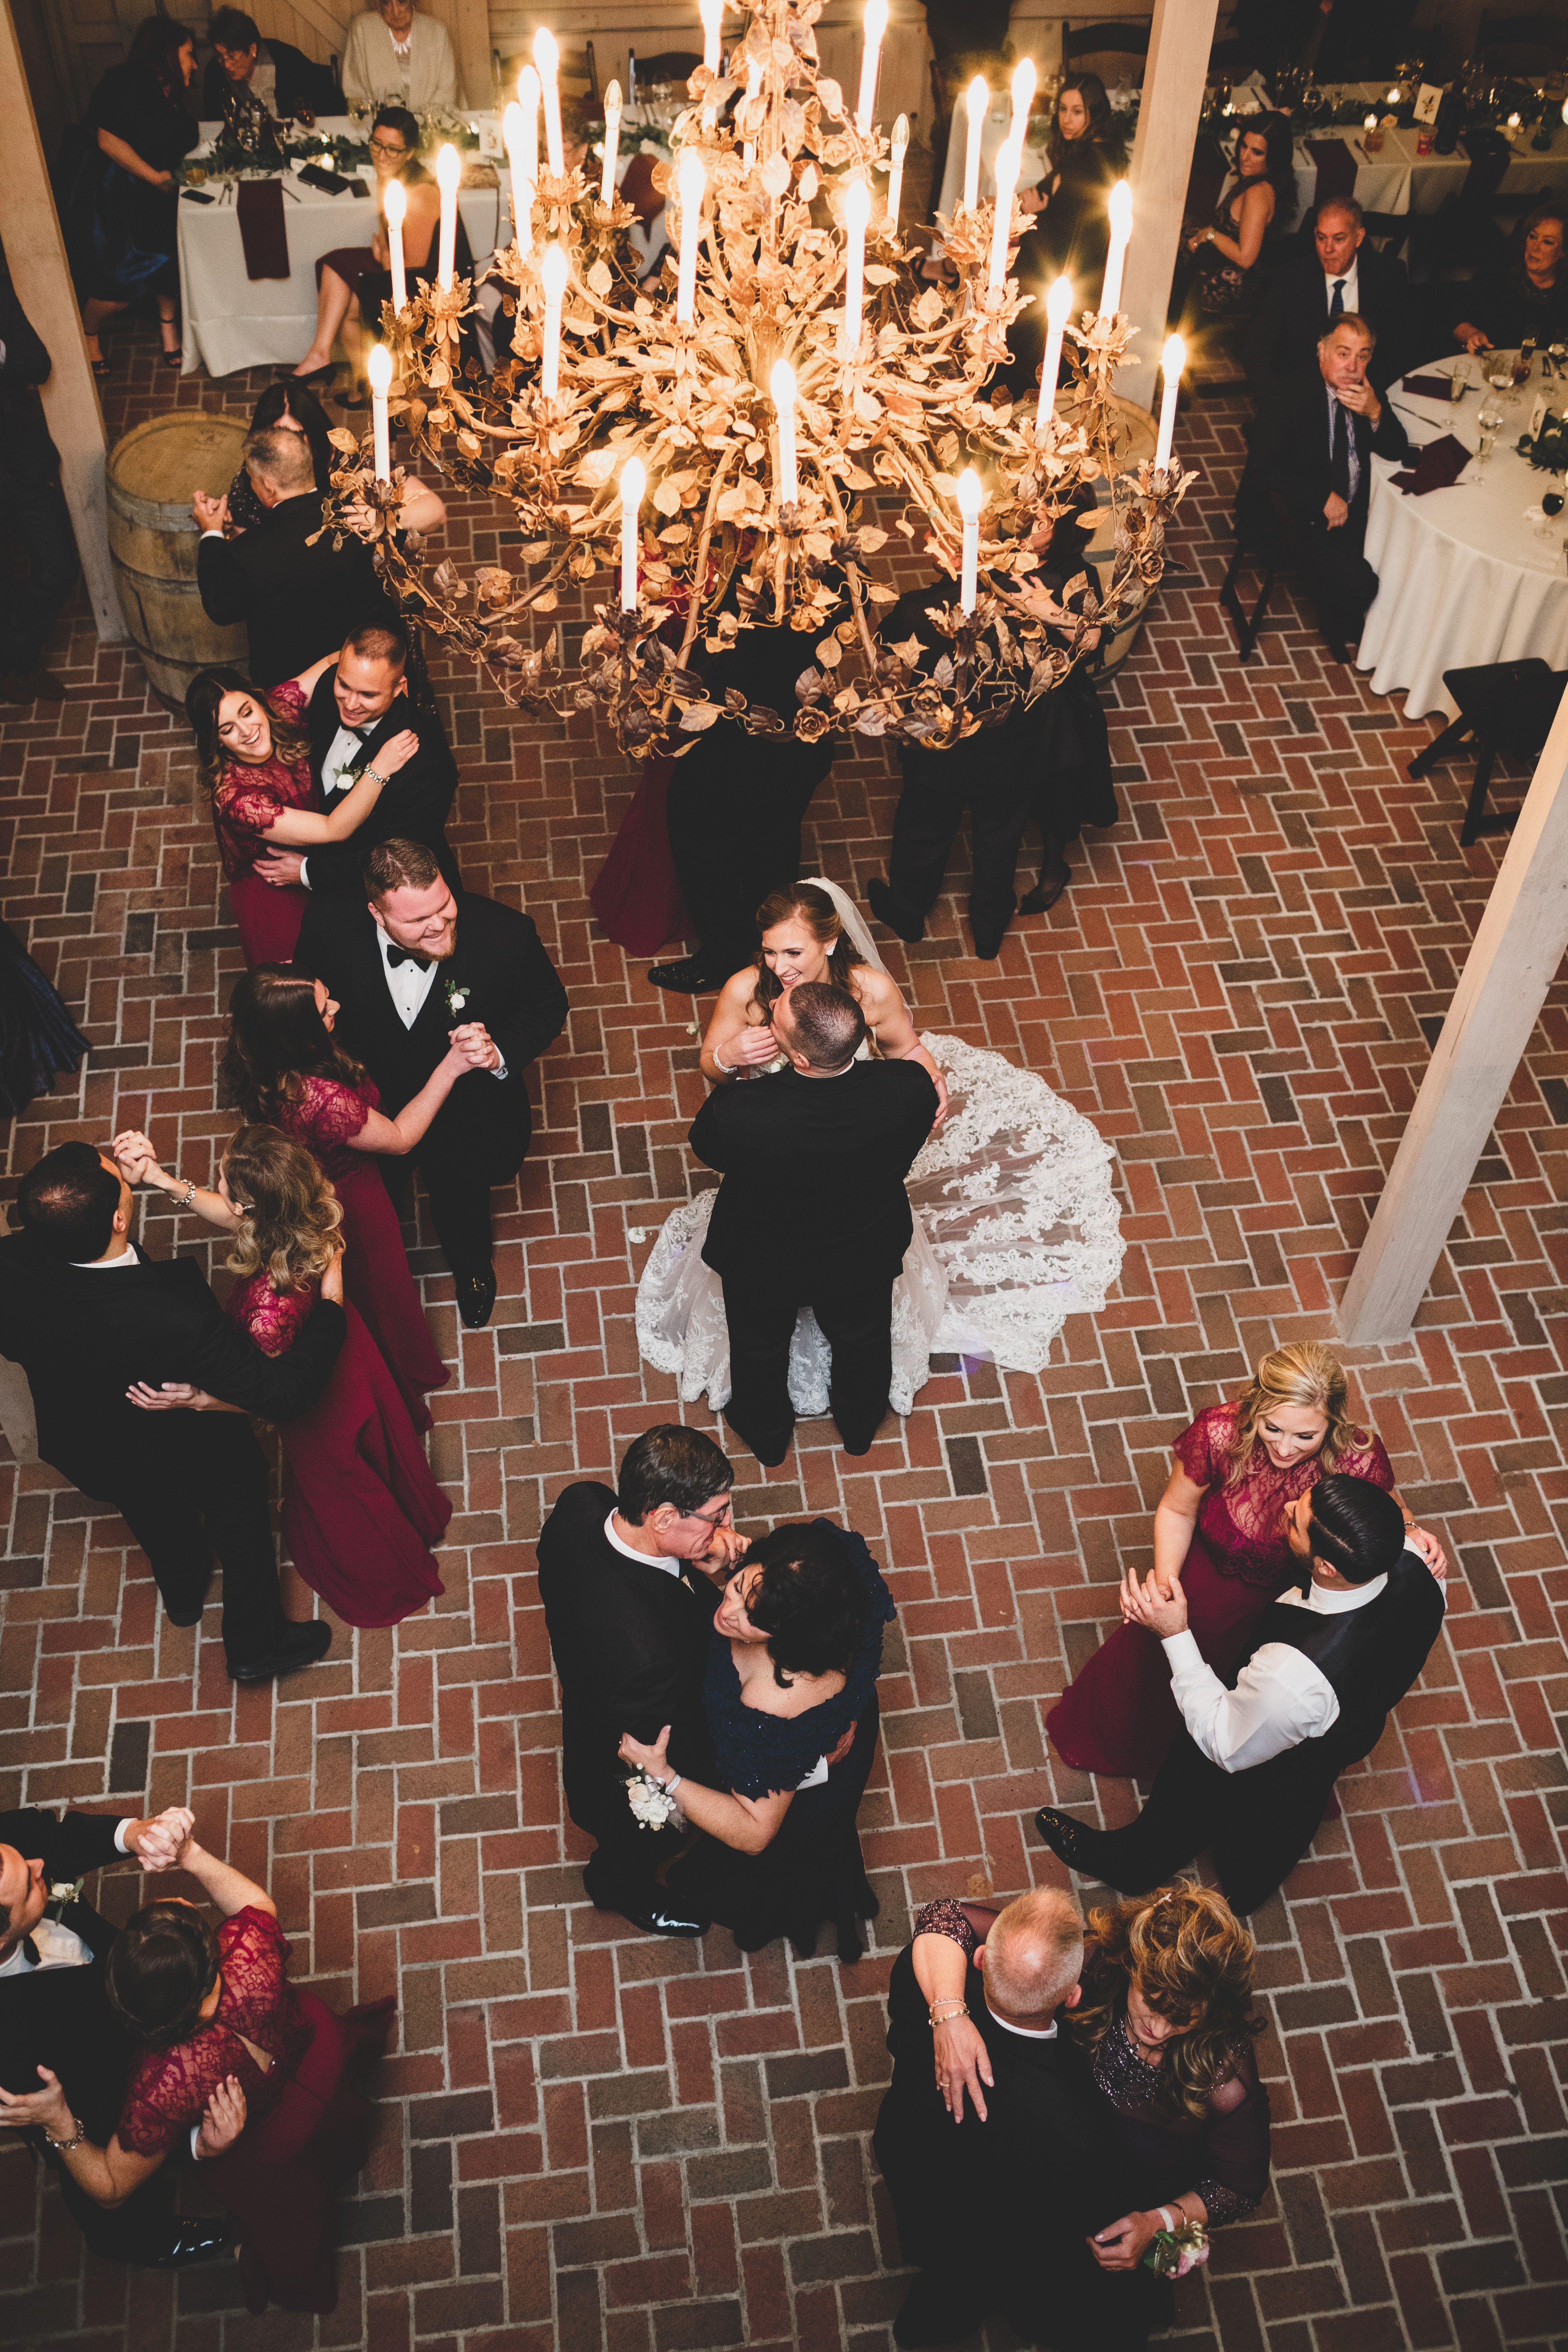 Edel Haus Alpaca Farm New Jersey Wedding | Rustic Barn ...